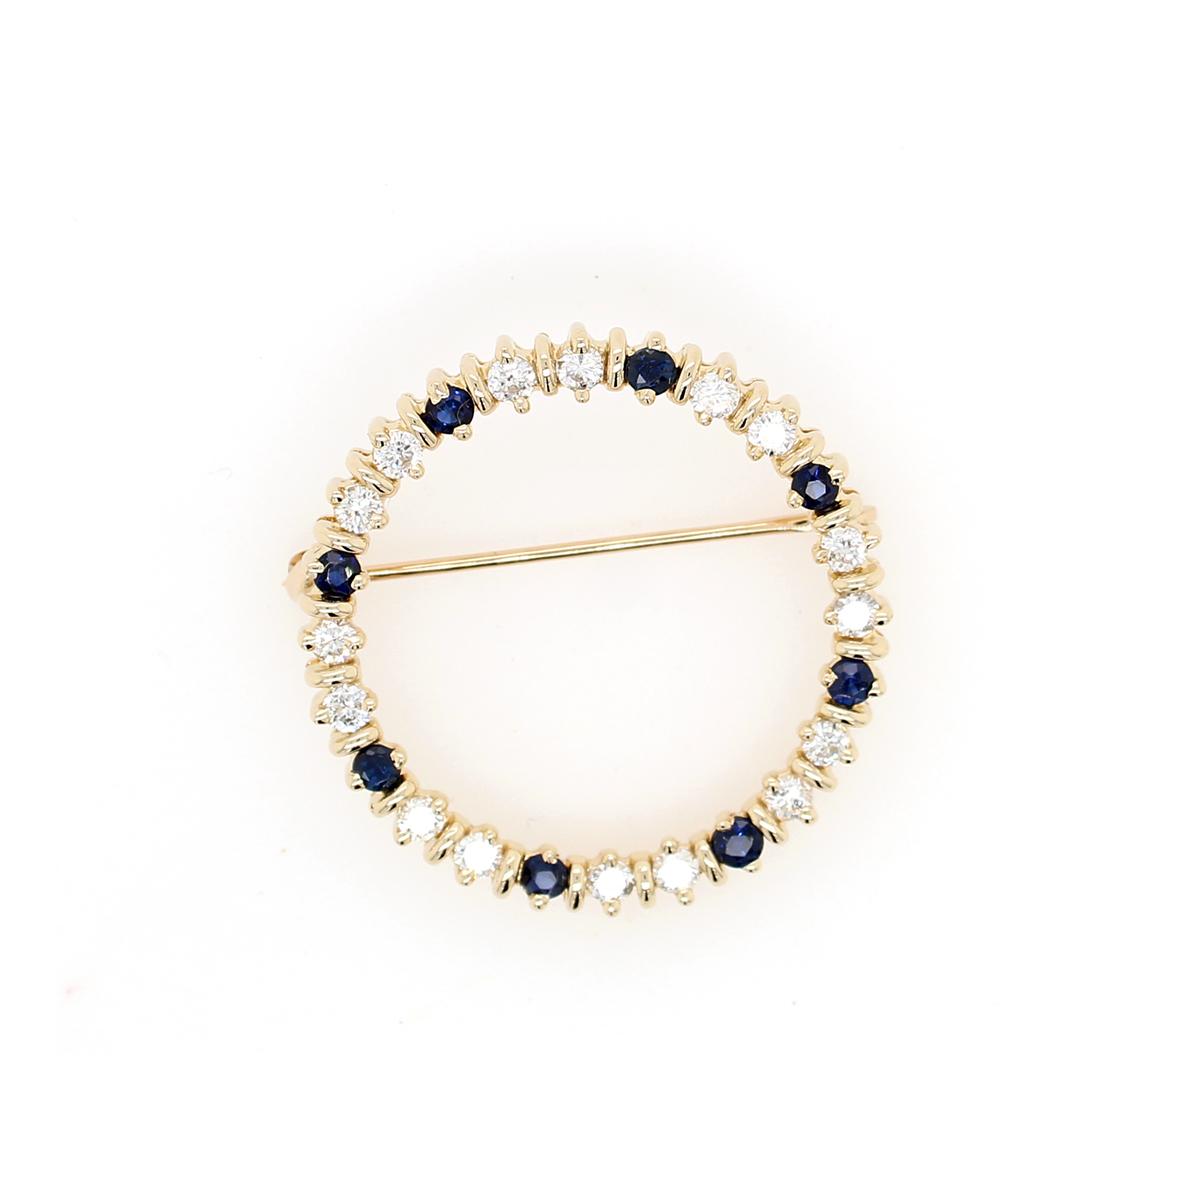 Vintage 14 Karat Yellow Gold Round Sapphire and Diamond Pin